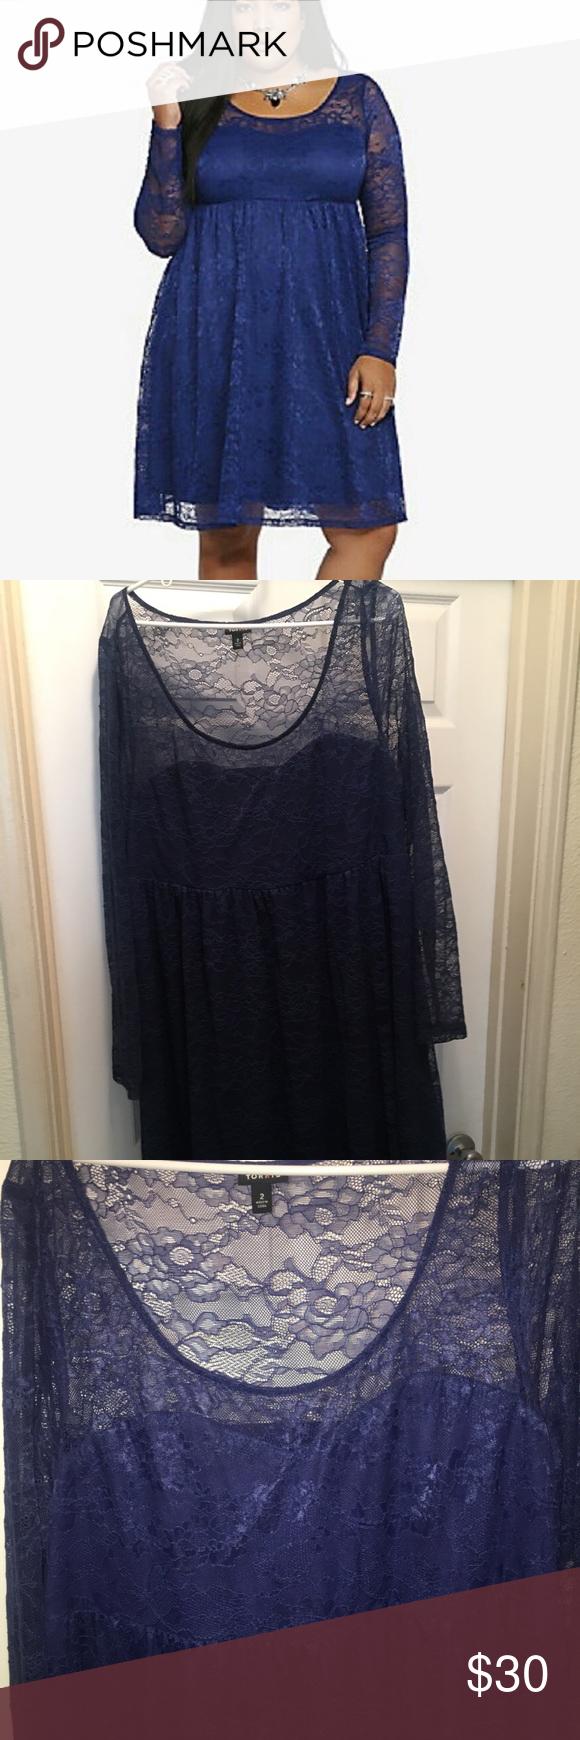 Lace dress torrid  Blue Lace Torrid Dress  My Posh Picks  Pinterest  Torrid